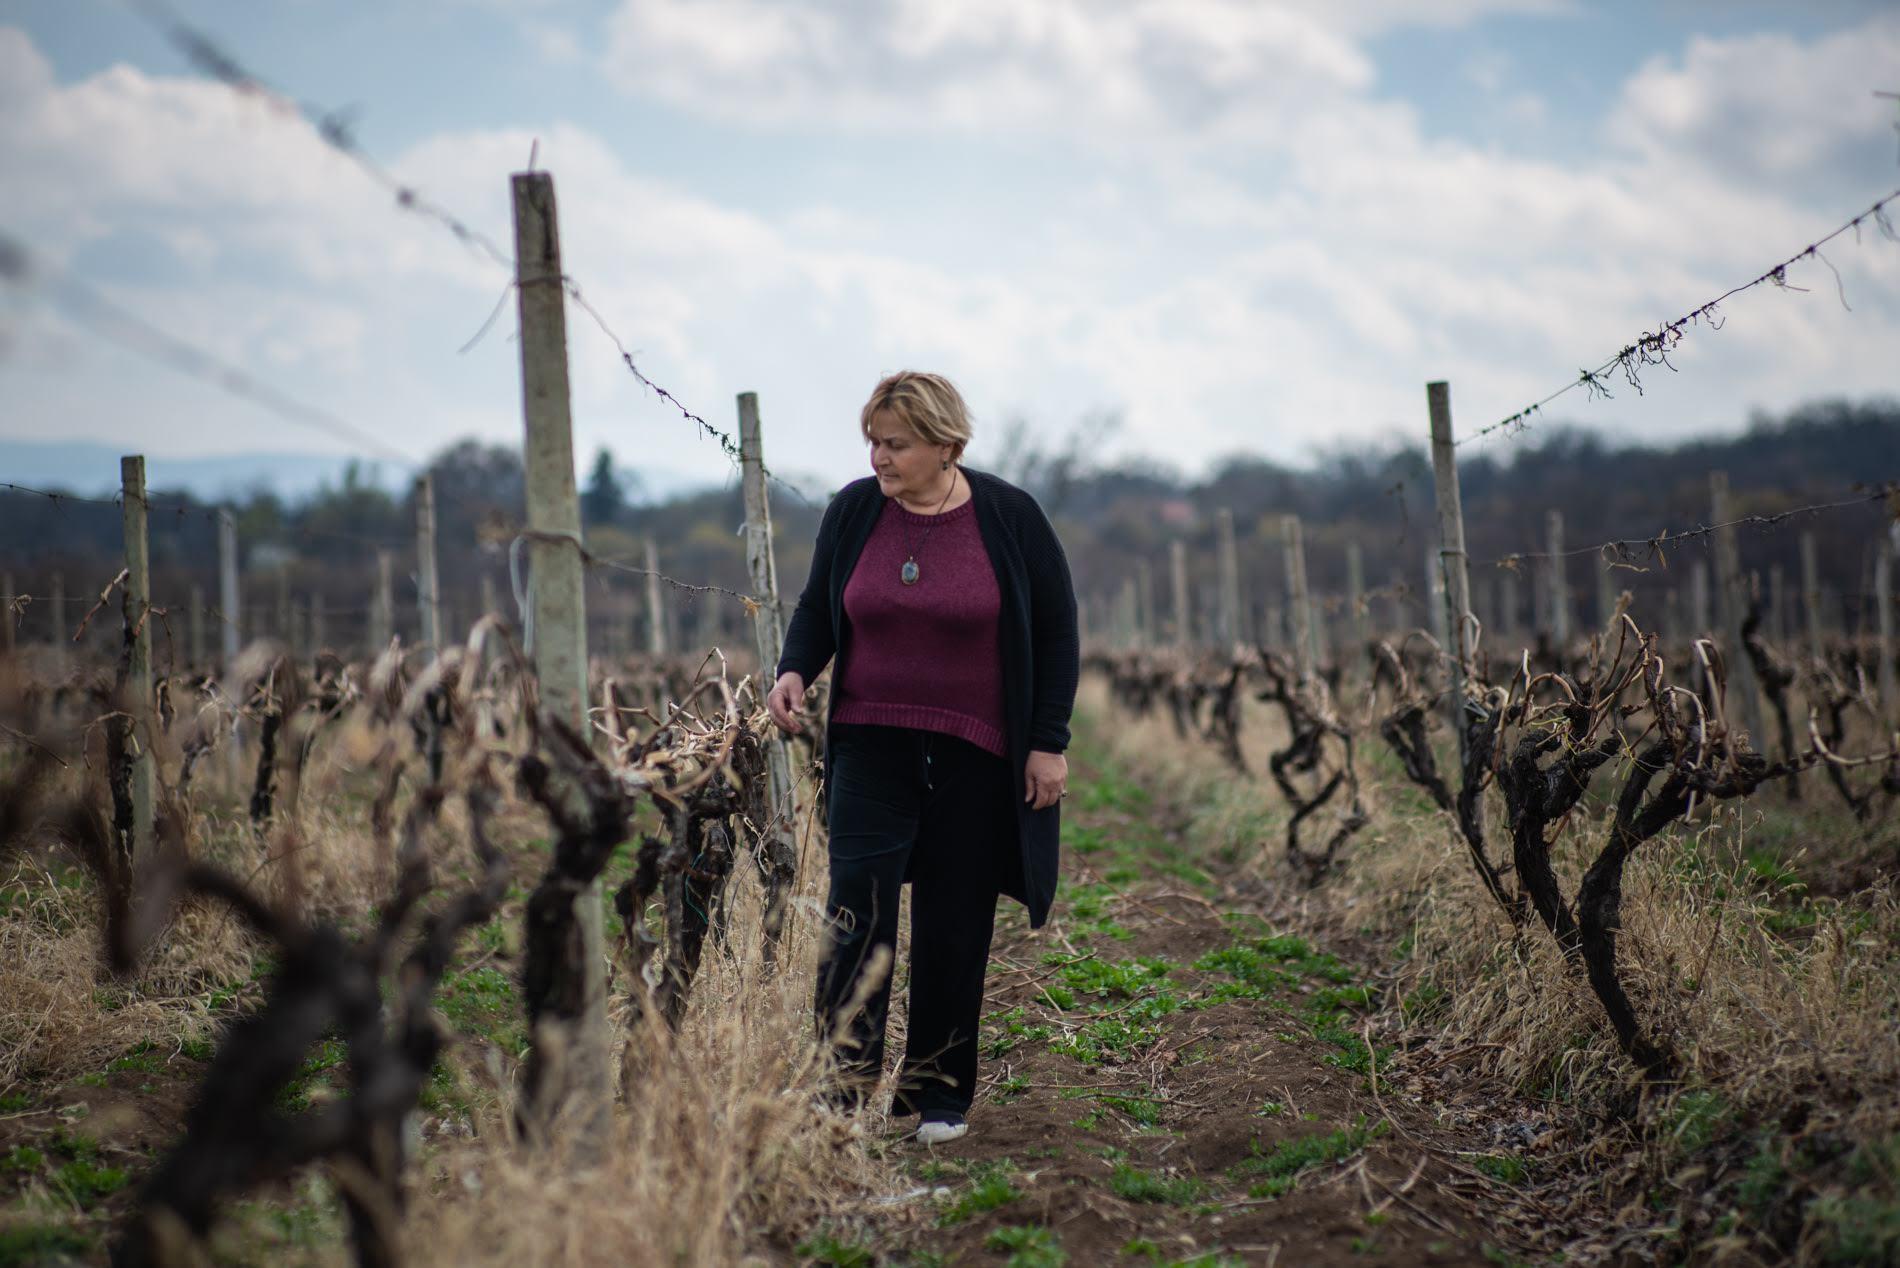 'All men in the village are talking about my vineyard', Marina Sirbilashvili says.  Photo: Tamuna Chkareuli/OC Media.